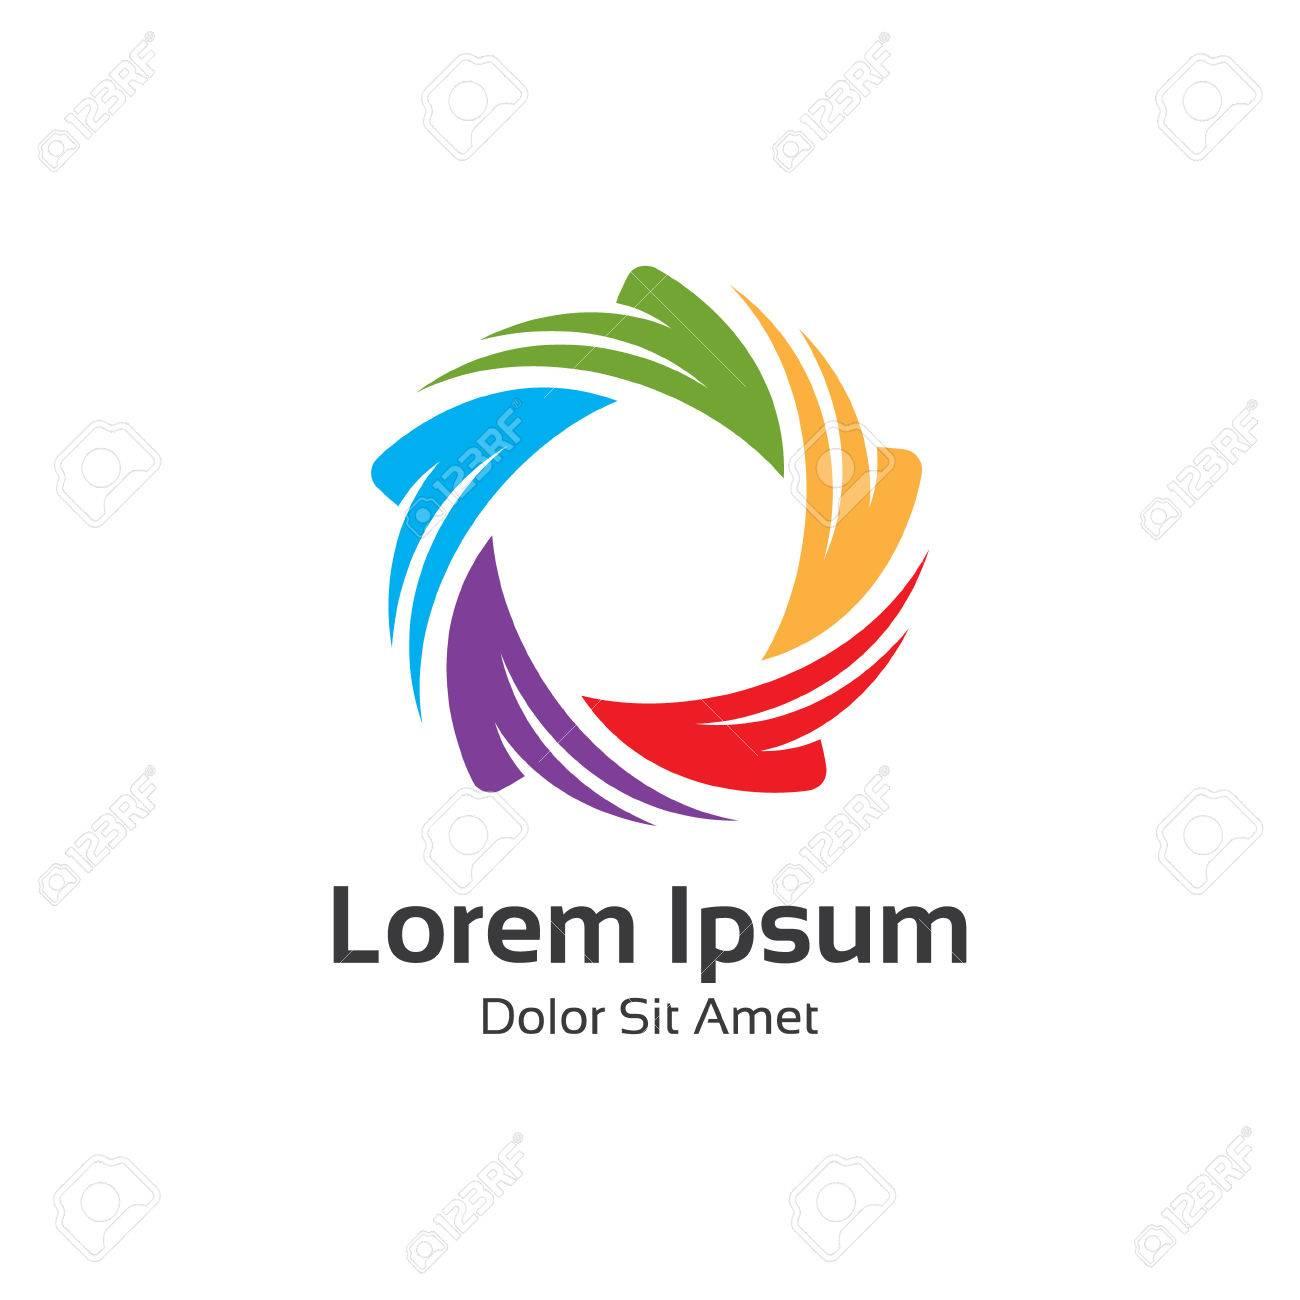 Colorful 3d circle star logo template. Star vector logo design branding corporate identity. - 54695585